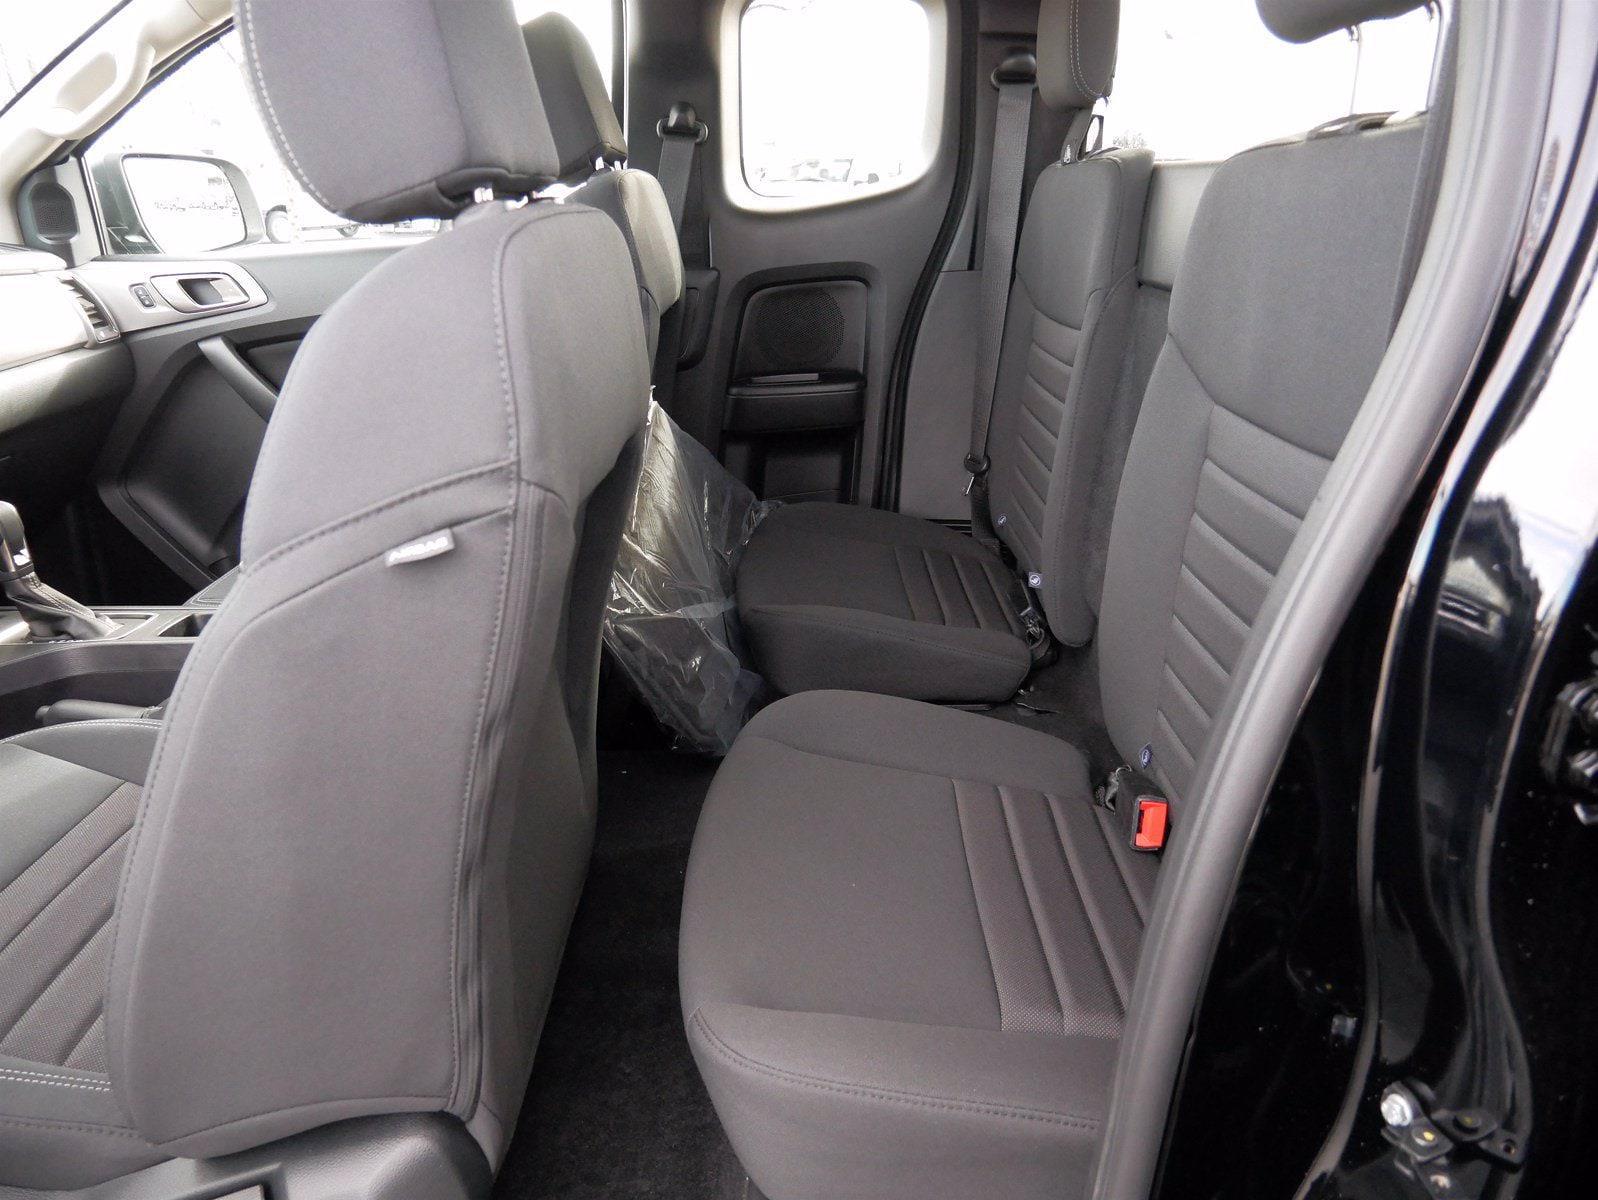 2021 Ford Ranger Super Cab 4x4, Pickup #24100 - photo 20